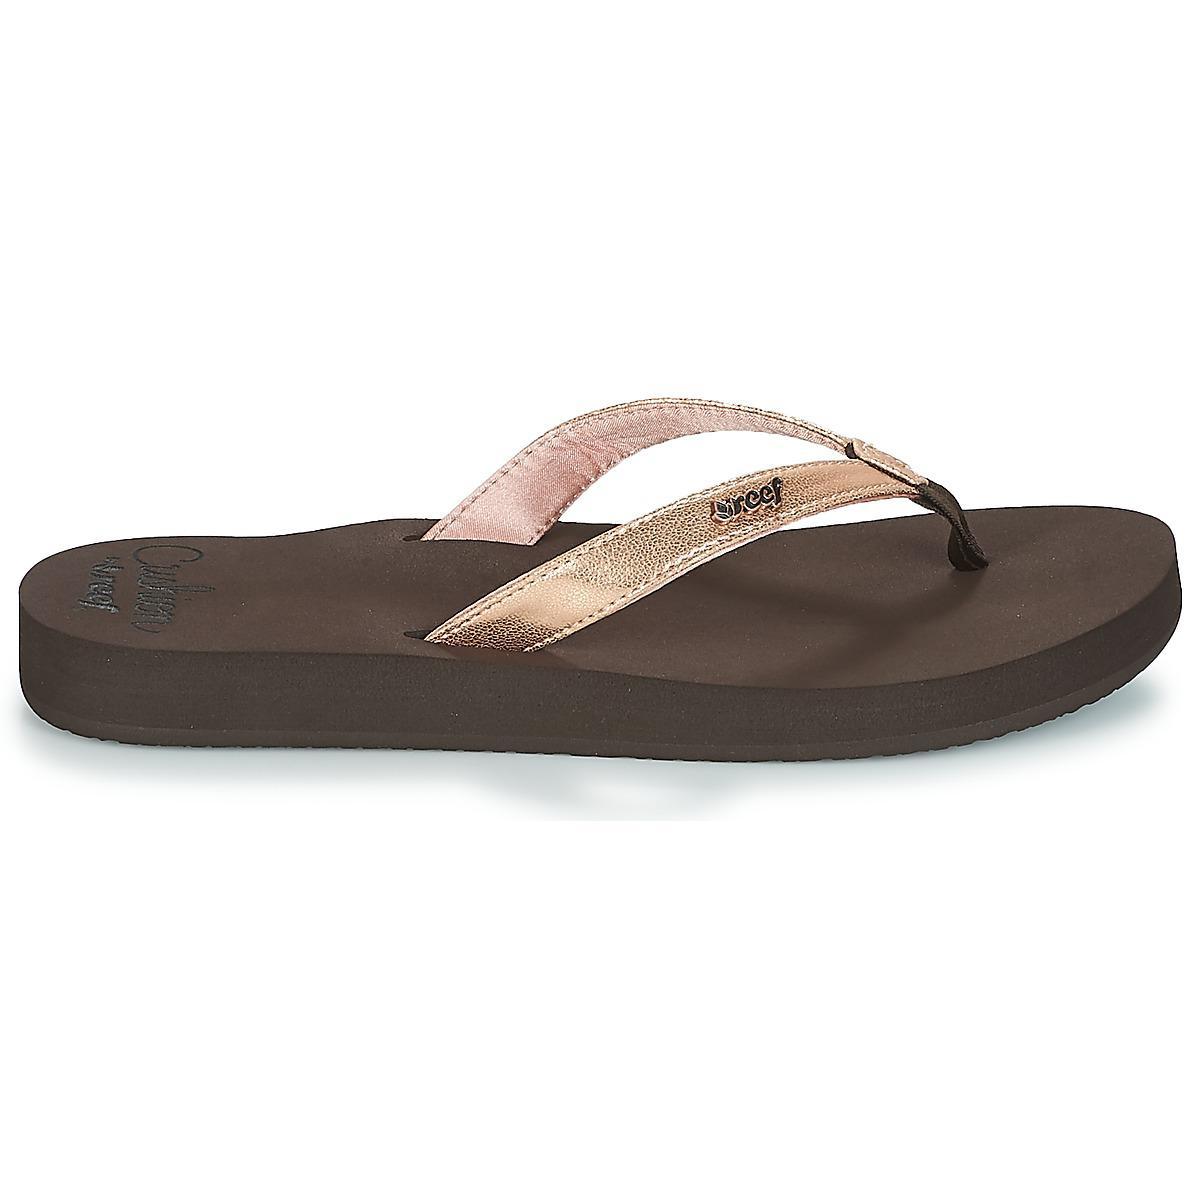 23ee0feaf27d Reef Cushion Luna Flip Flops   Sandals (shoes) in Brown - Lyst